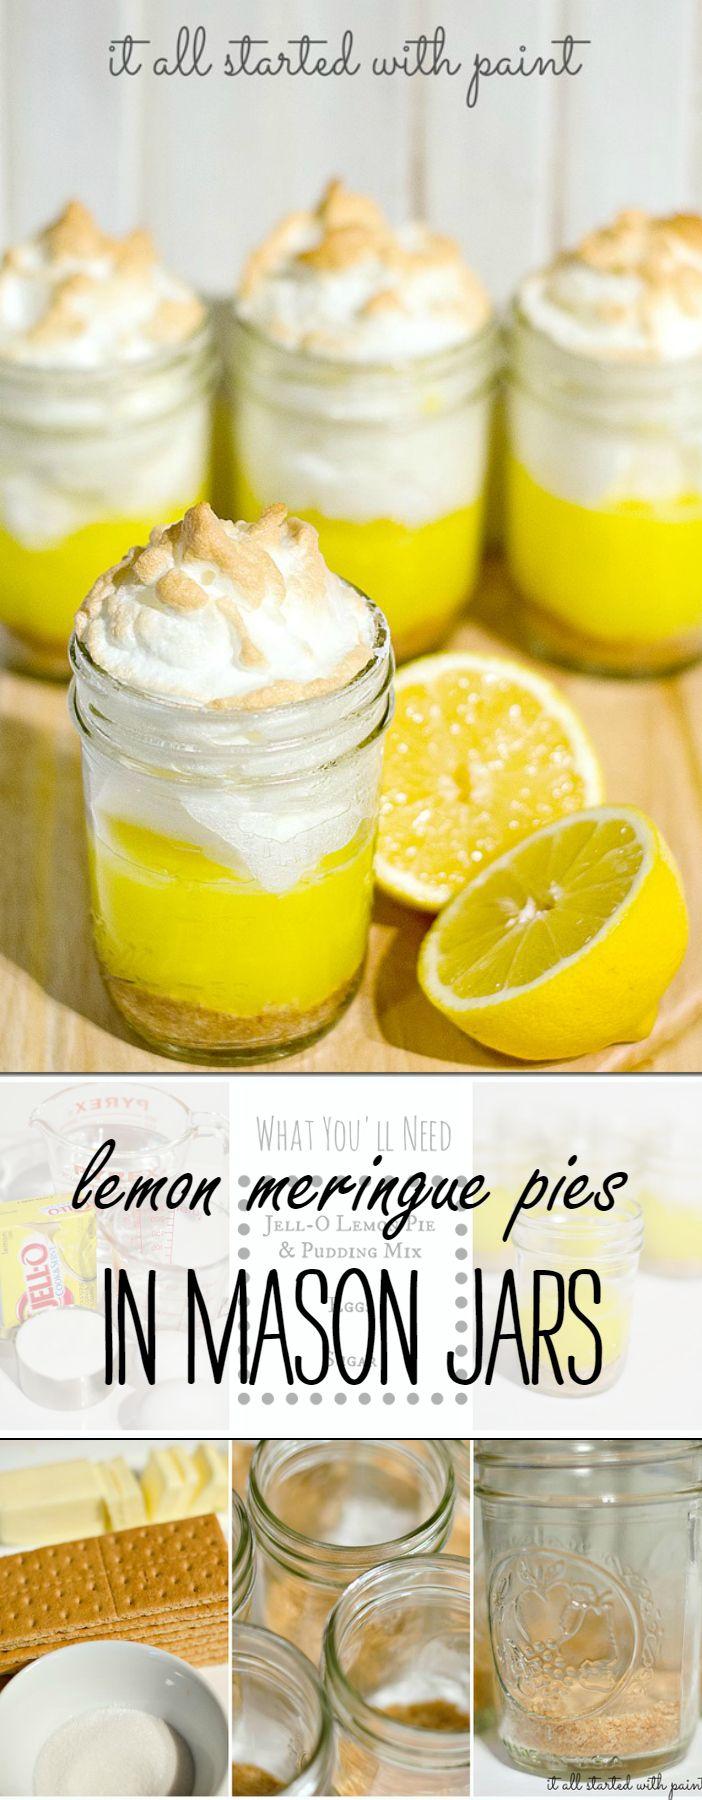 mason jar lemon meringue pies - It All Started With Paint